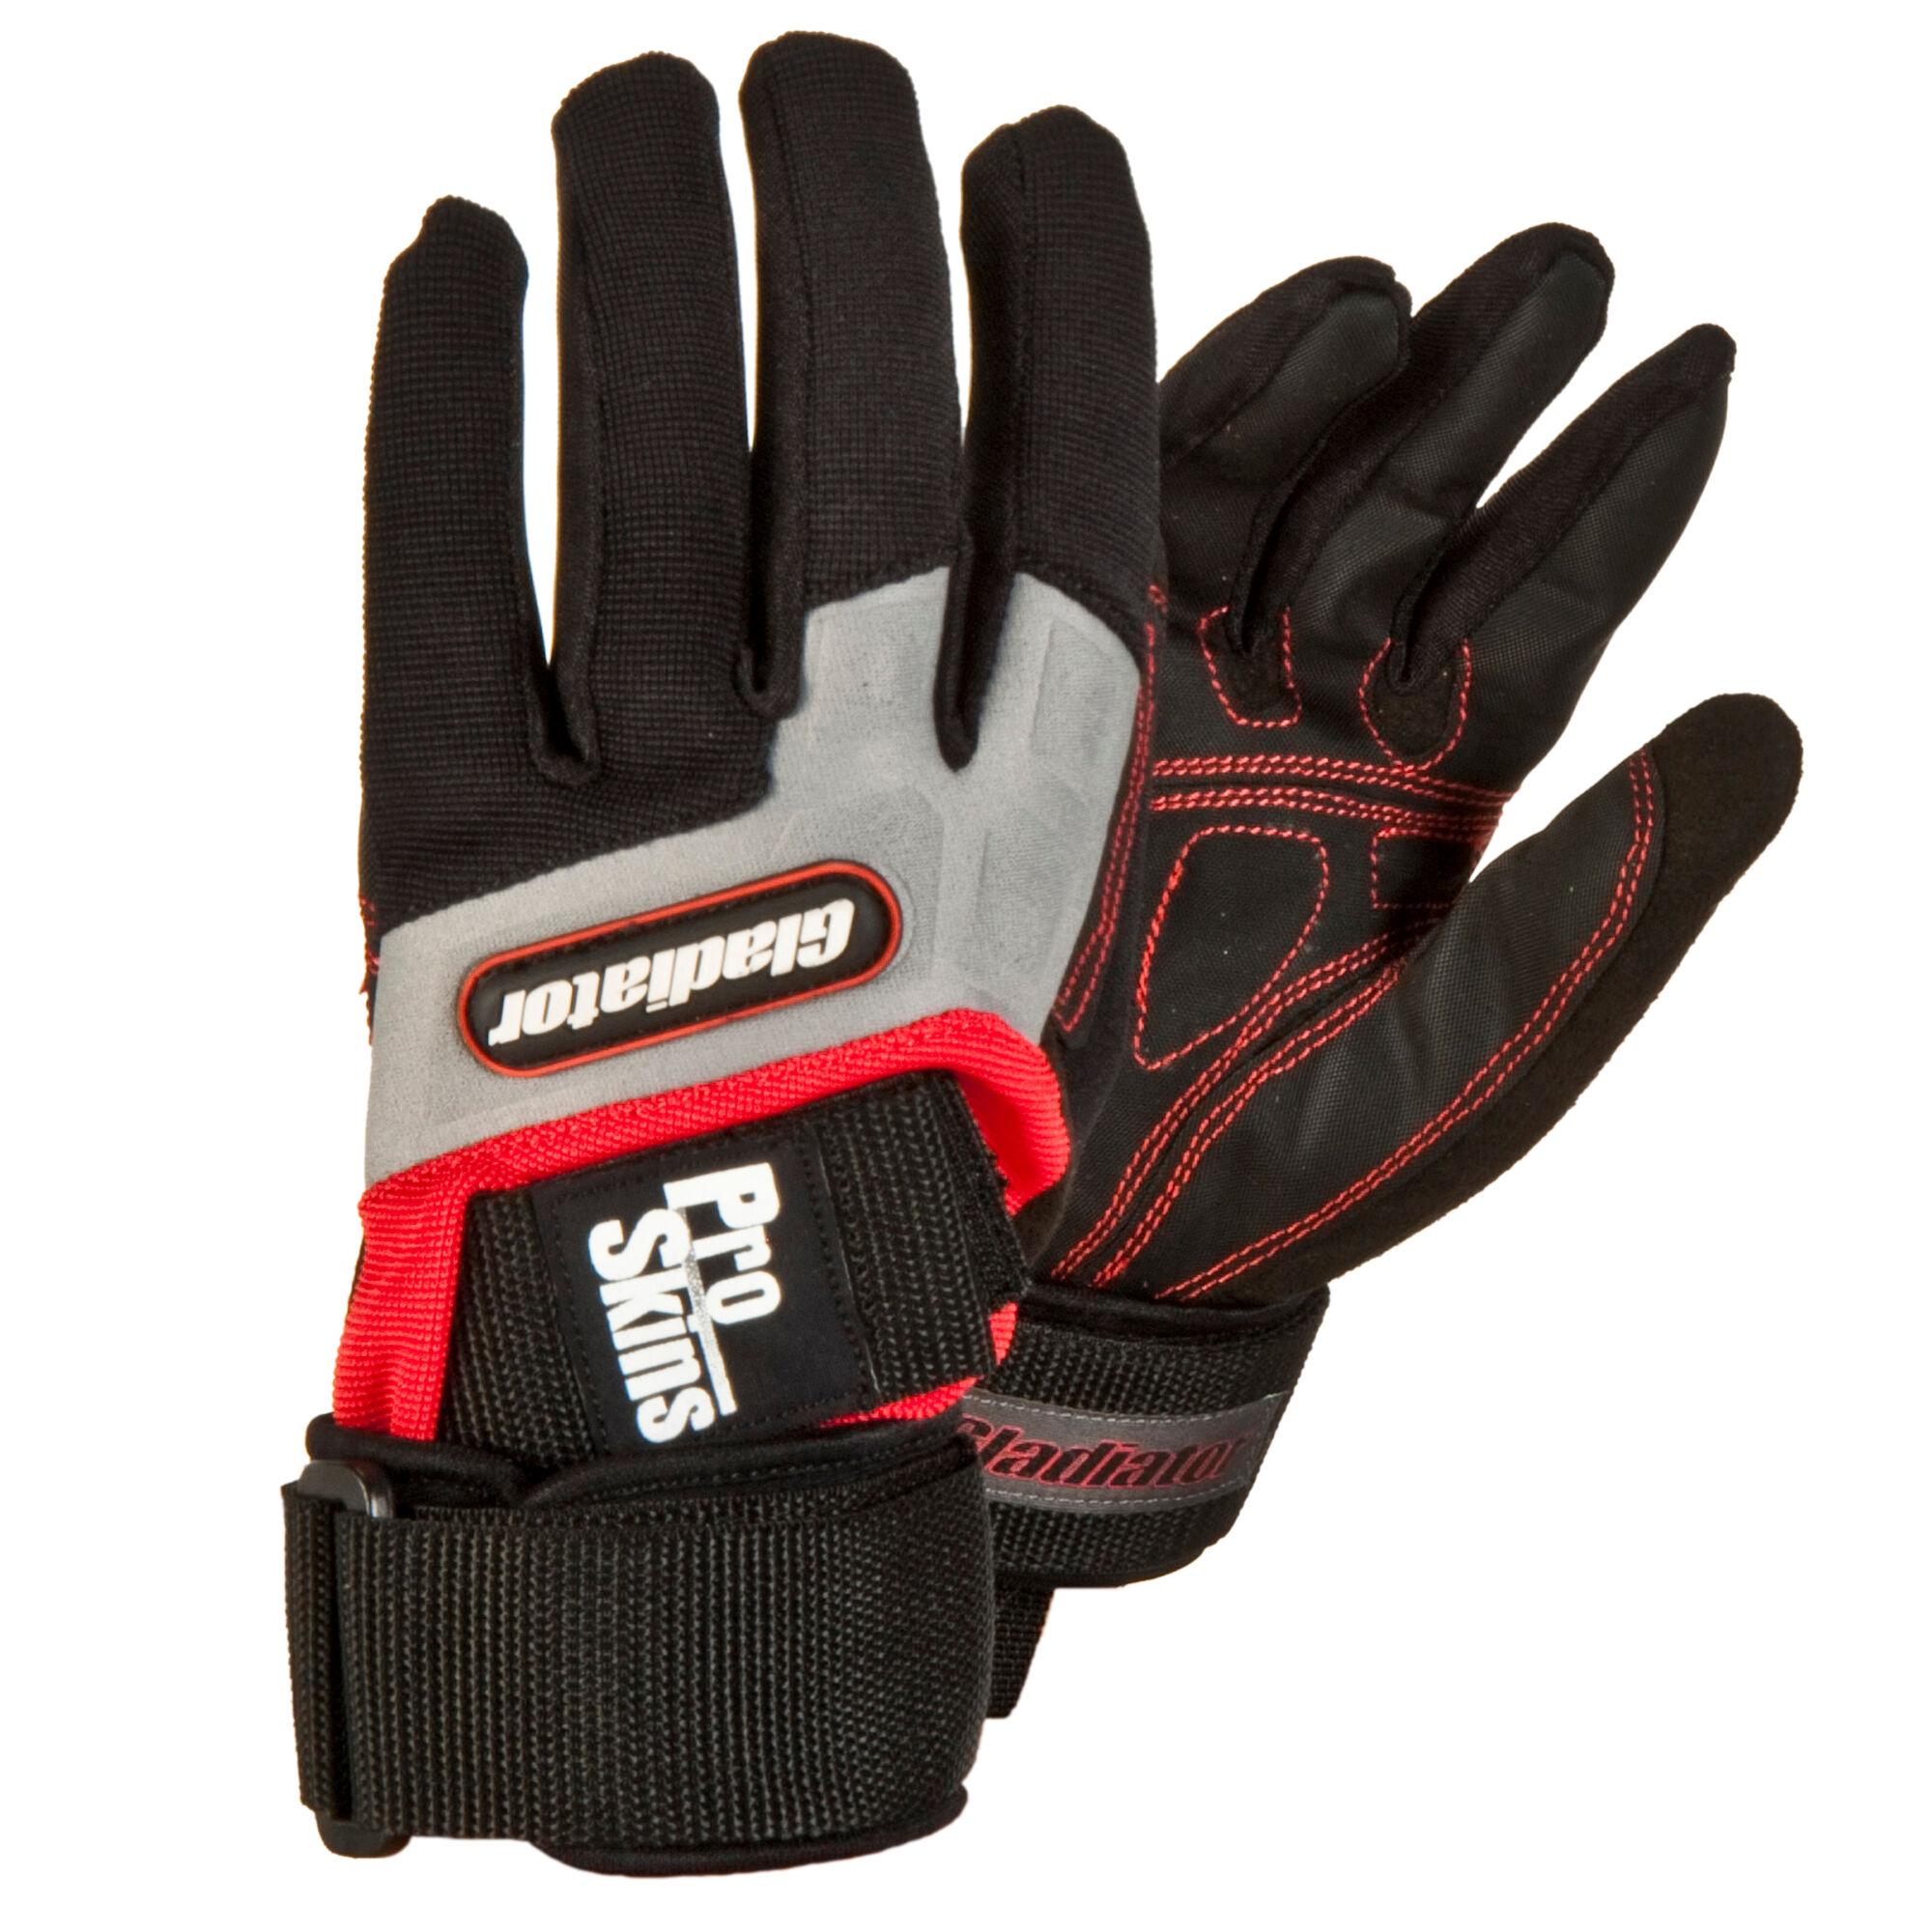 Gladiator Pro Skins Full-Finger Waterski Glove